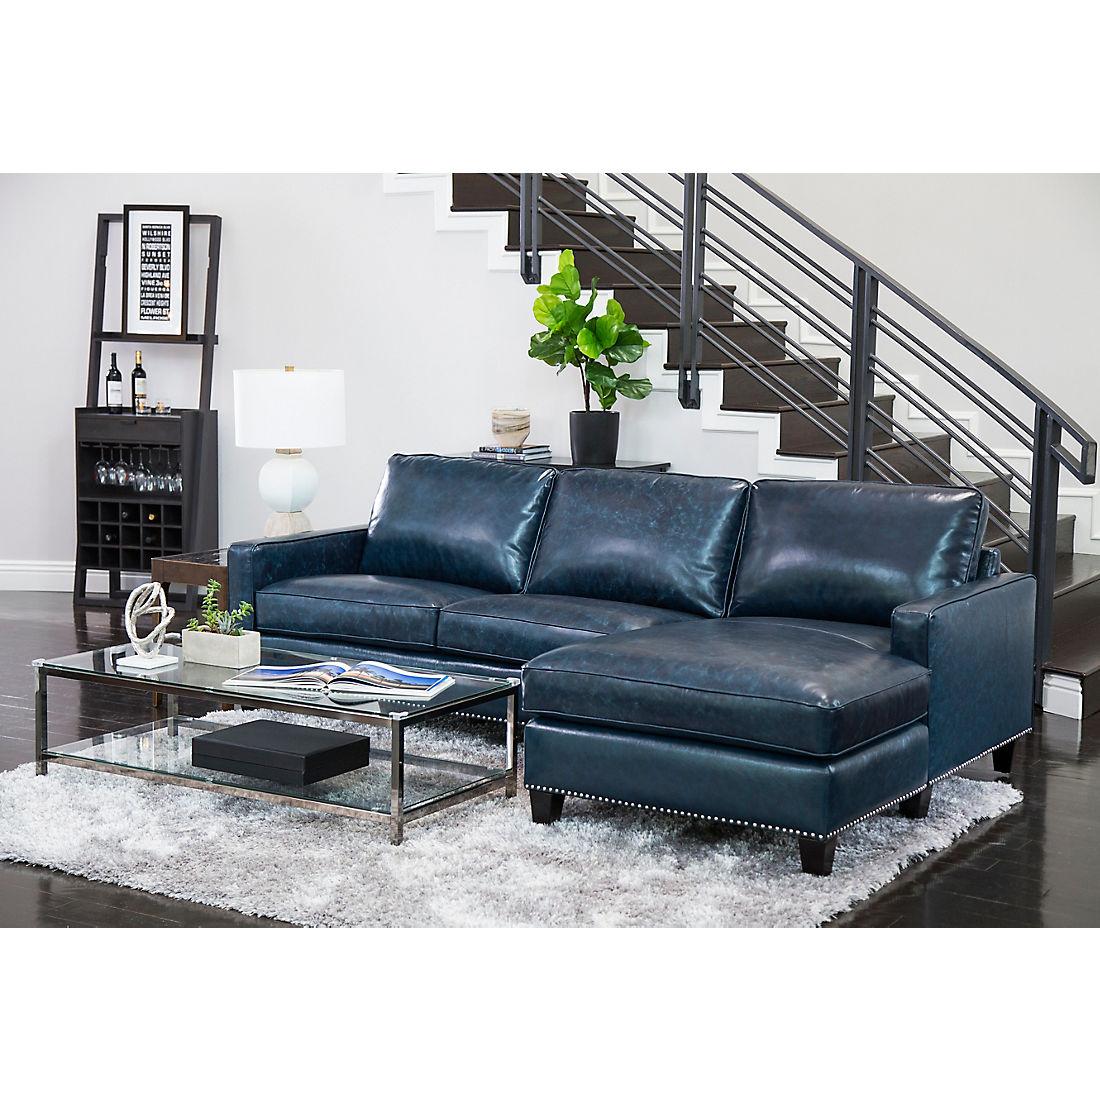 Pleasing Abbyson Living Lisbon Top Grain Leather Sectional Blue Alphanode Cool Chair Designs And Ideas Alphanodeonline